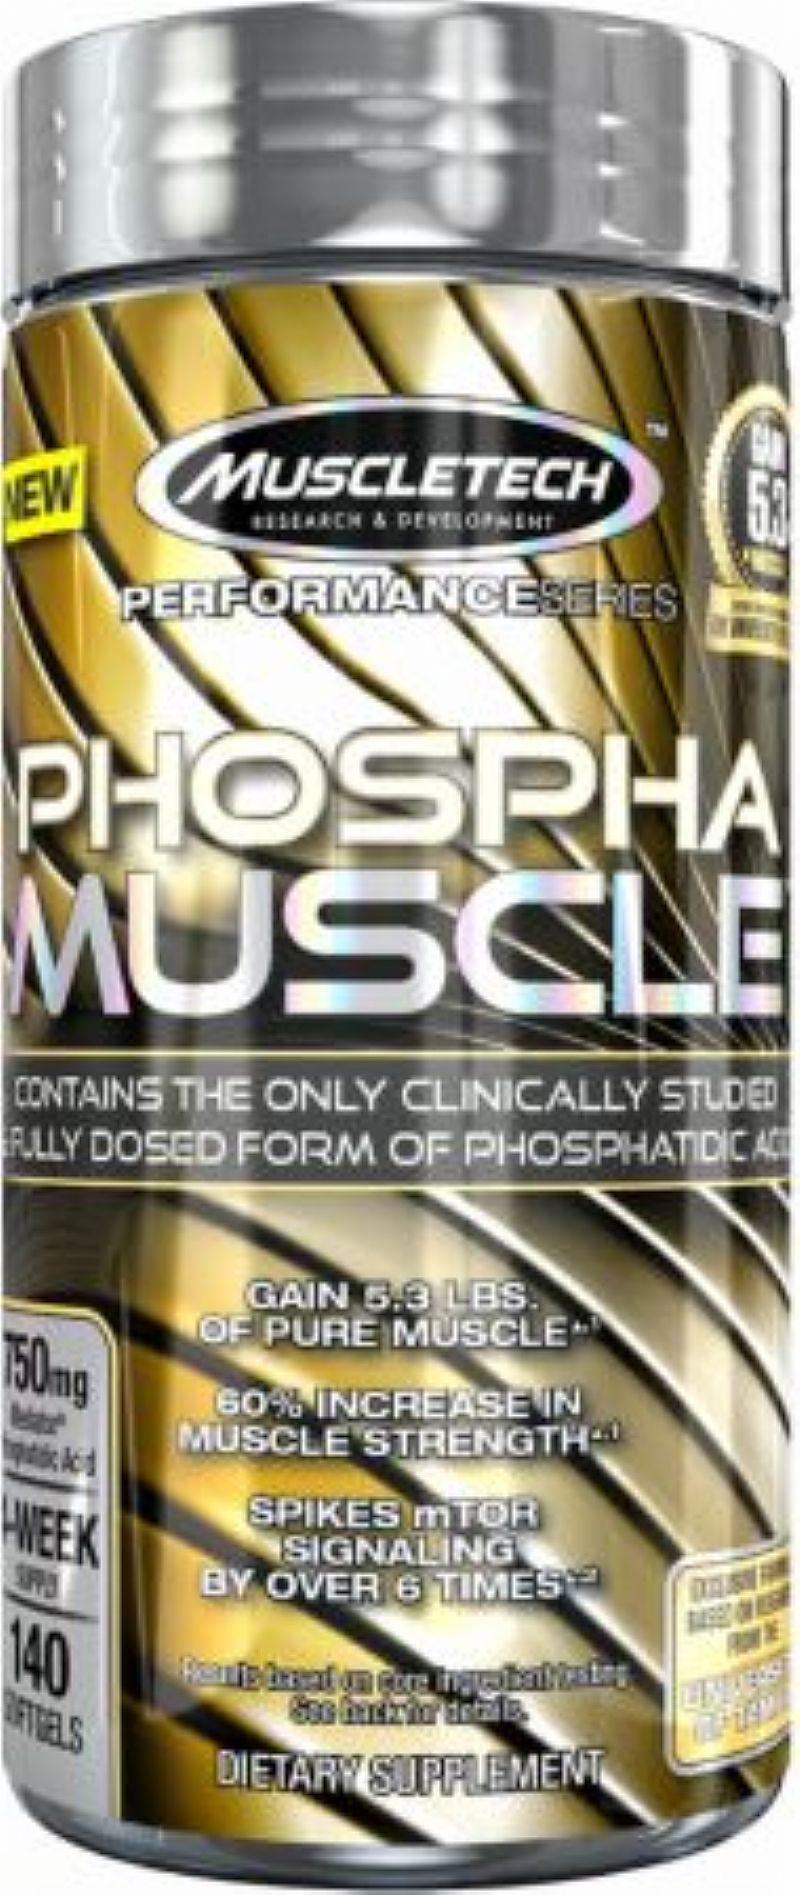 Phospha Muscle - Muscletech (140 Capsulas)